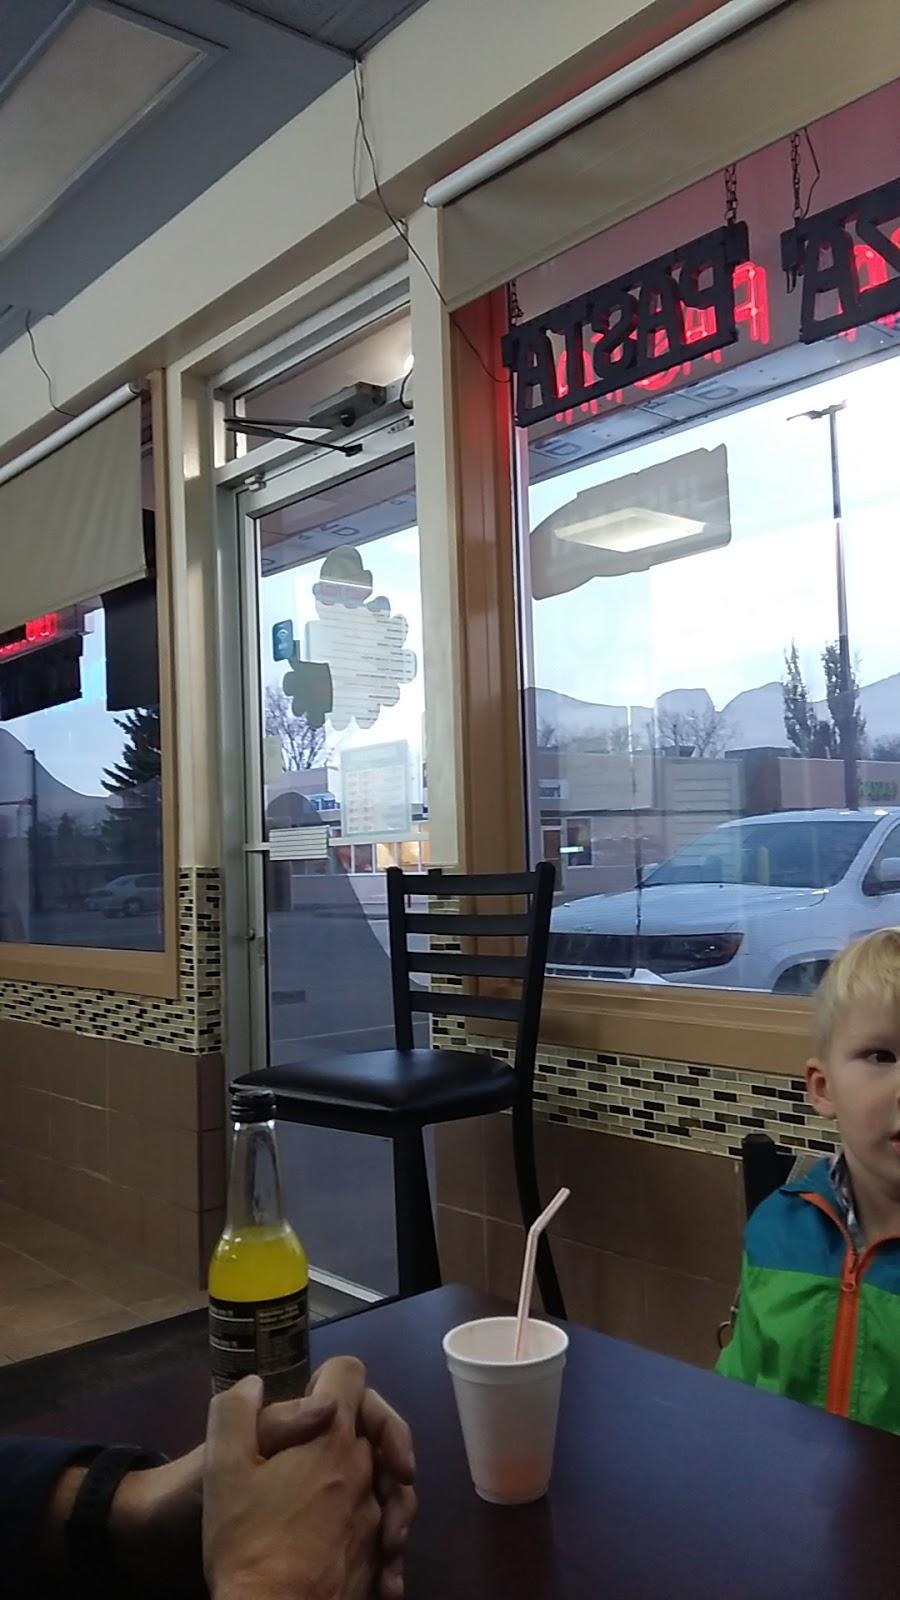 Sky Hy Pizza & Donair | restaurant | 10404 99 Ave, Fort Saskatchewan, AB T8L 3W2, Canada | 7809979882 OR +1 780-997-9882